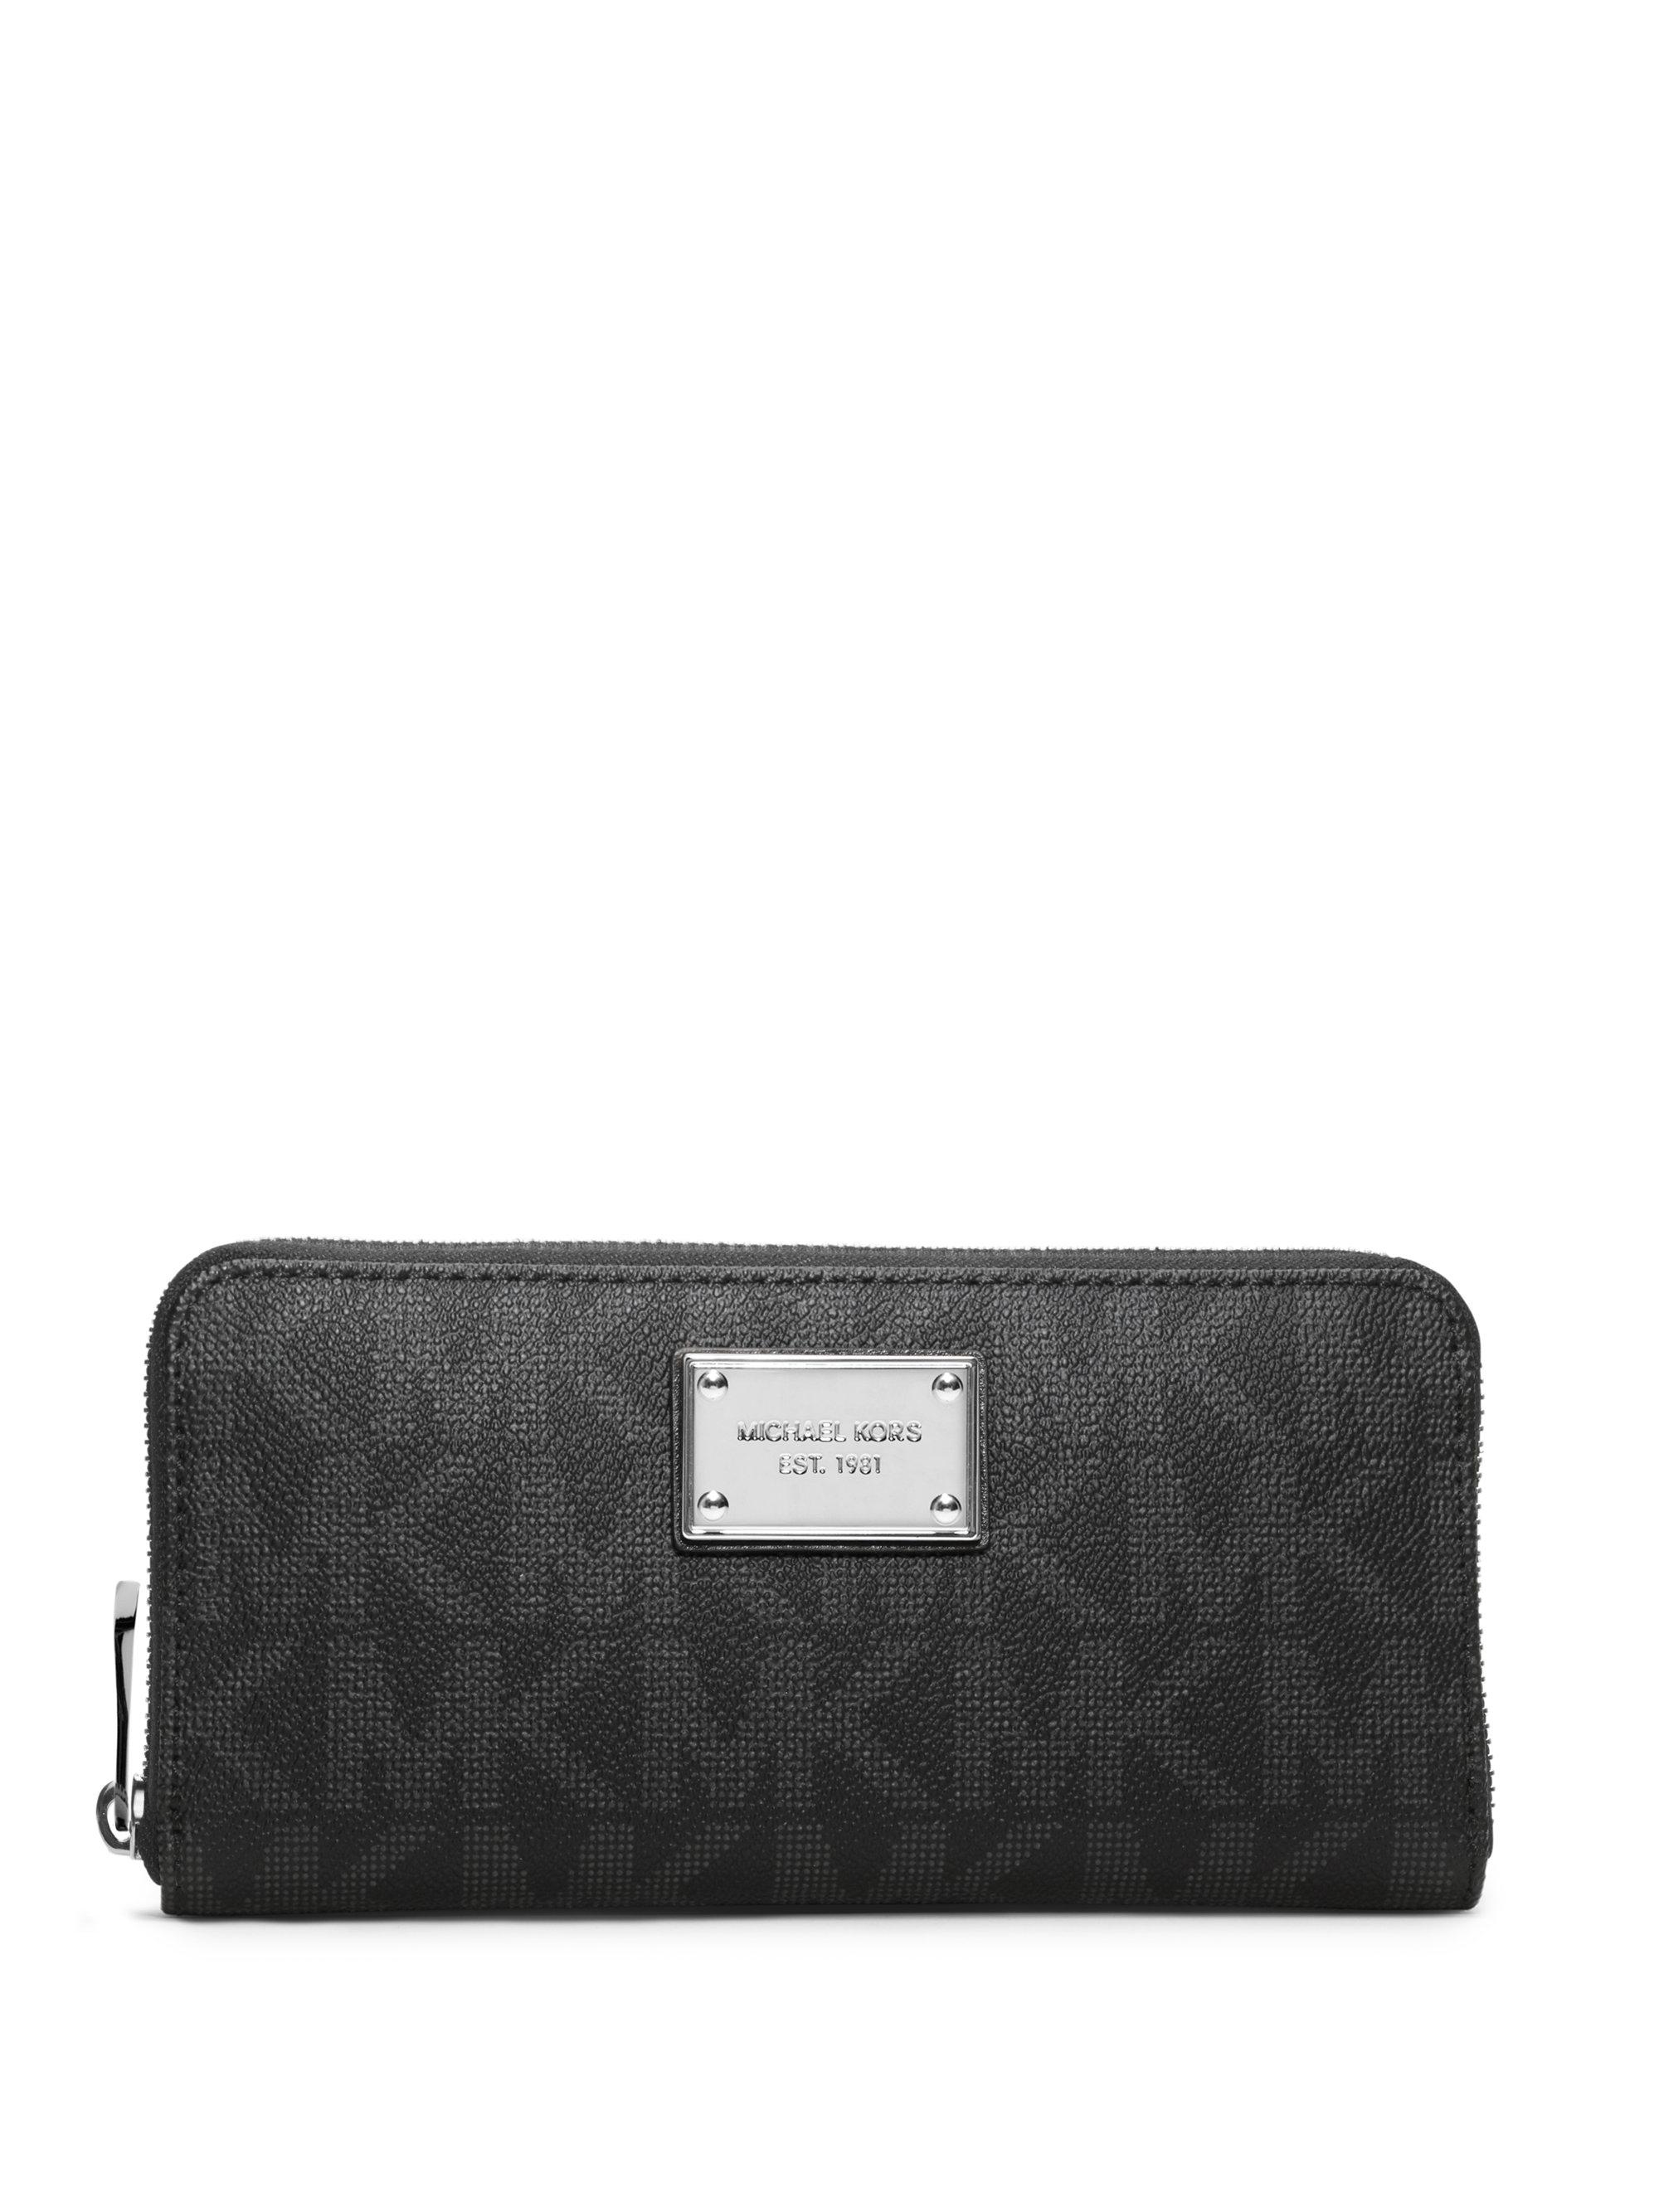 35c21edac458f0 MICHAEL Michael Kors Jet Set Travel Logo Continental Wallet in Black ...